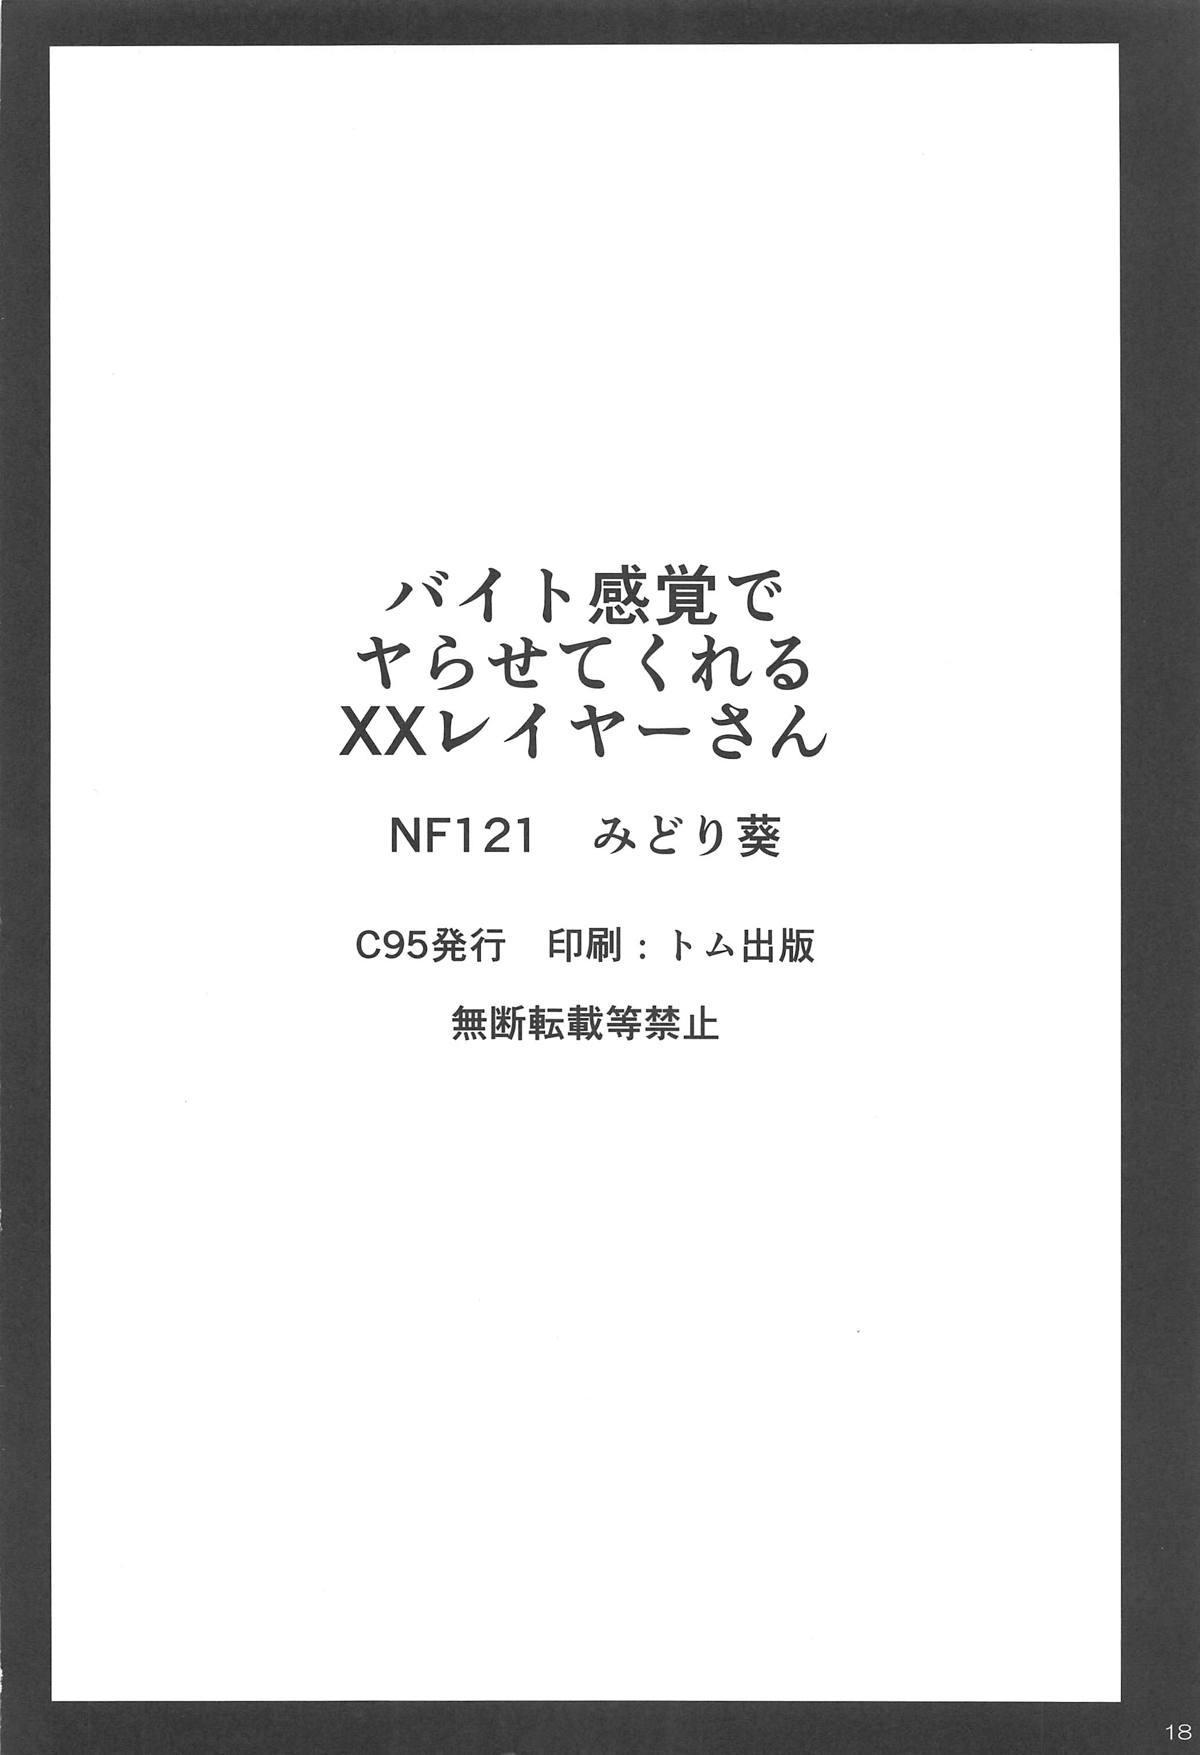 Beit Kankaku de Yarasete Kureru XX Layer-san 15